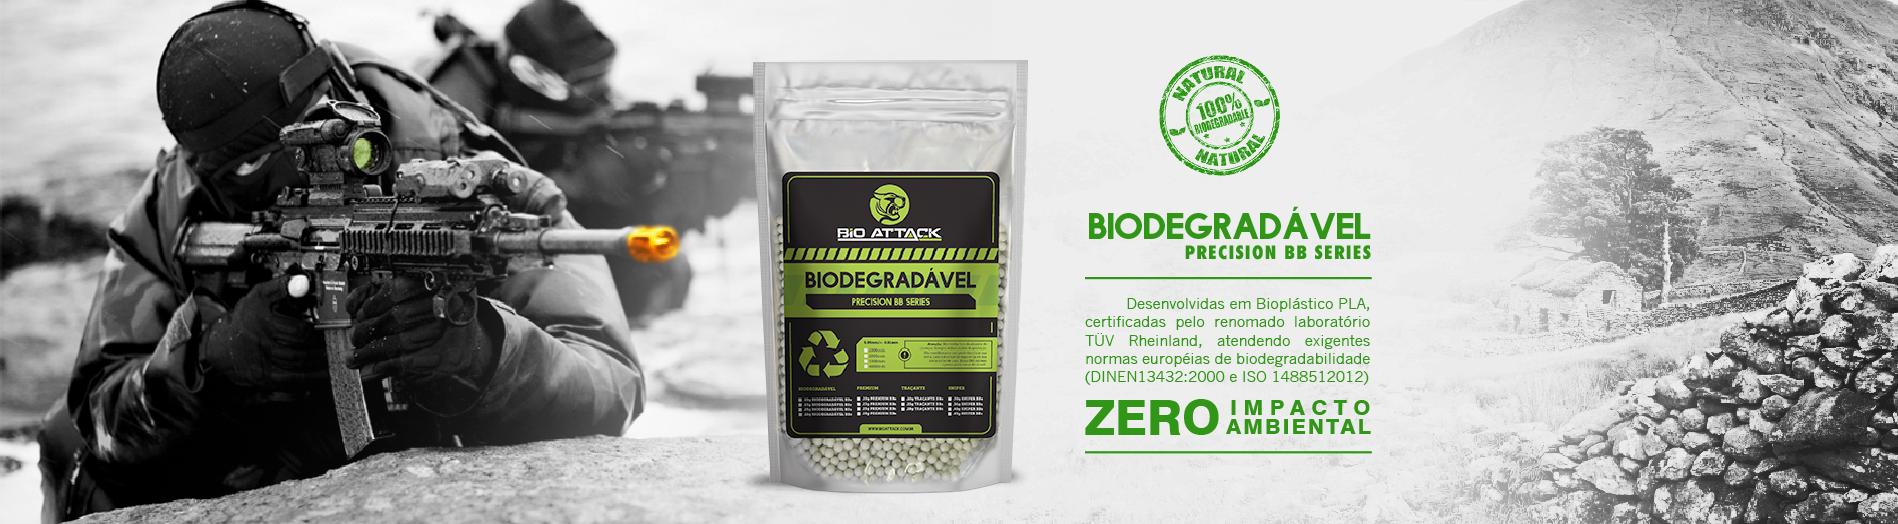 banner-bioattack-bio-attack-biodegradavel-bb-bbs-airsoft